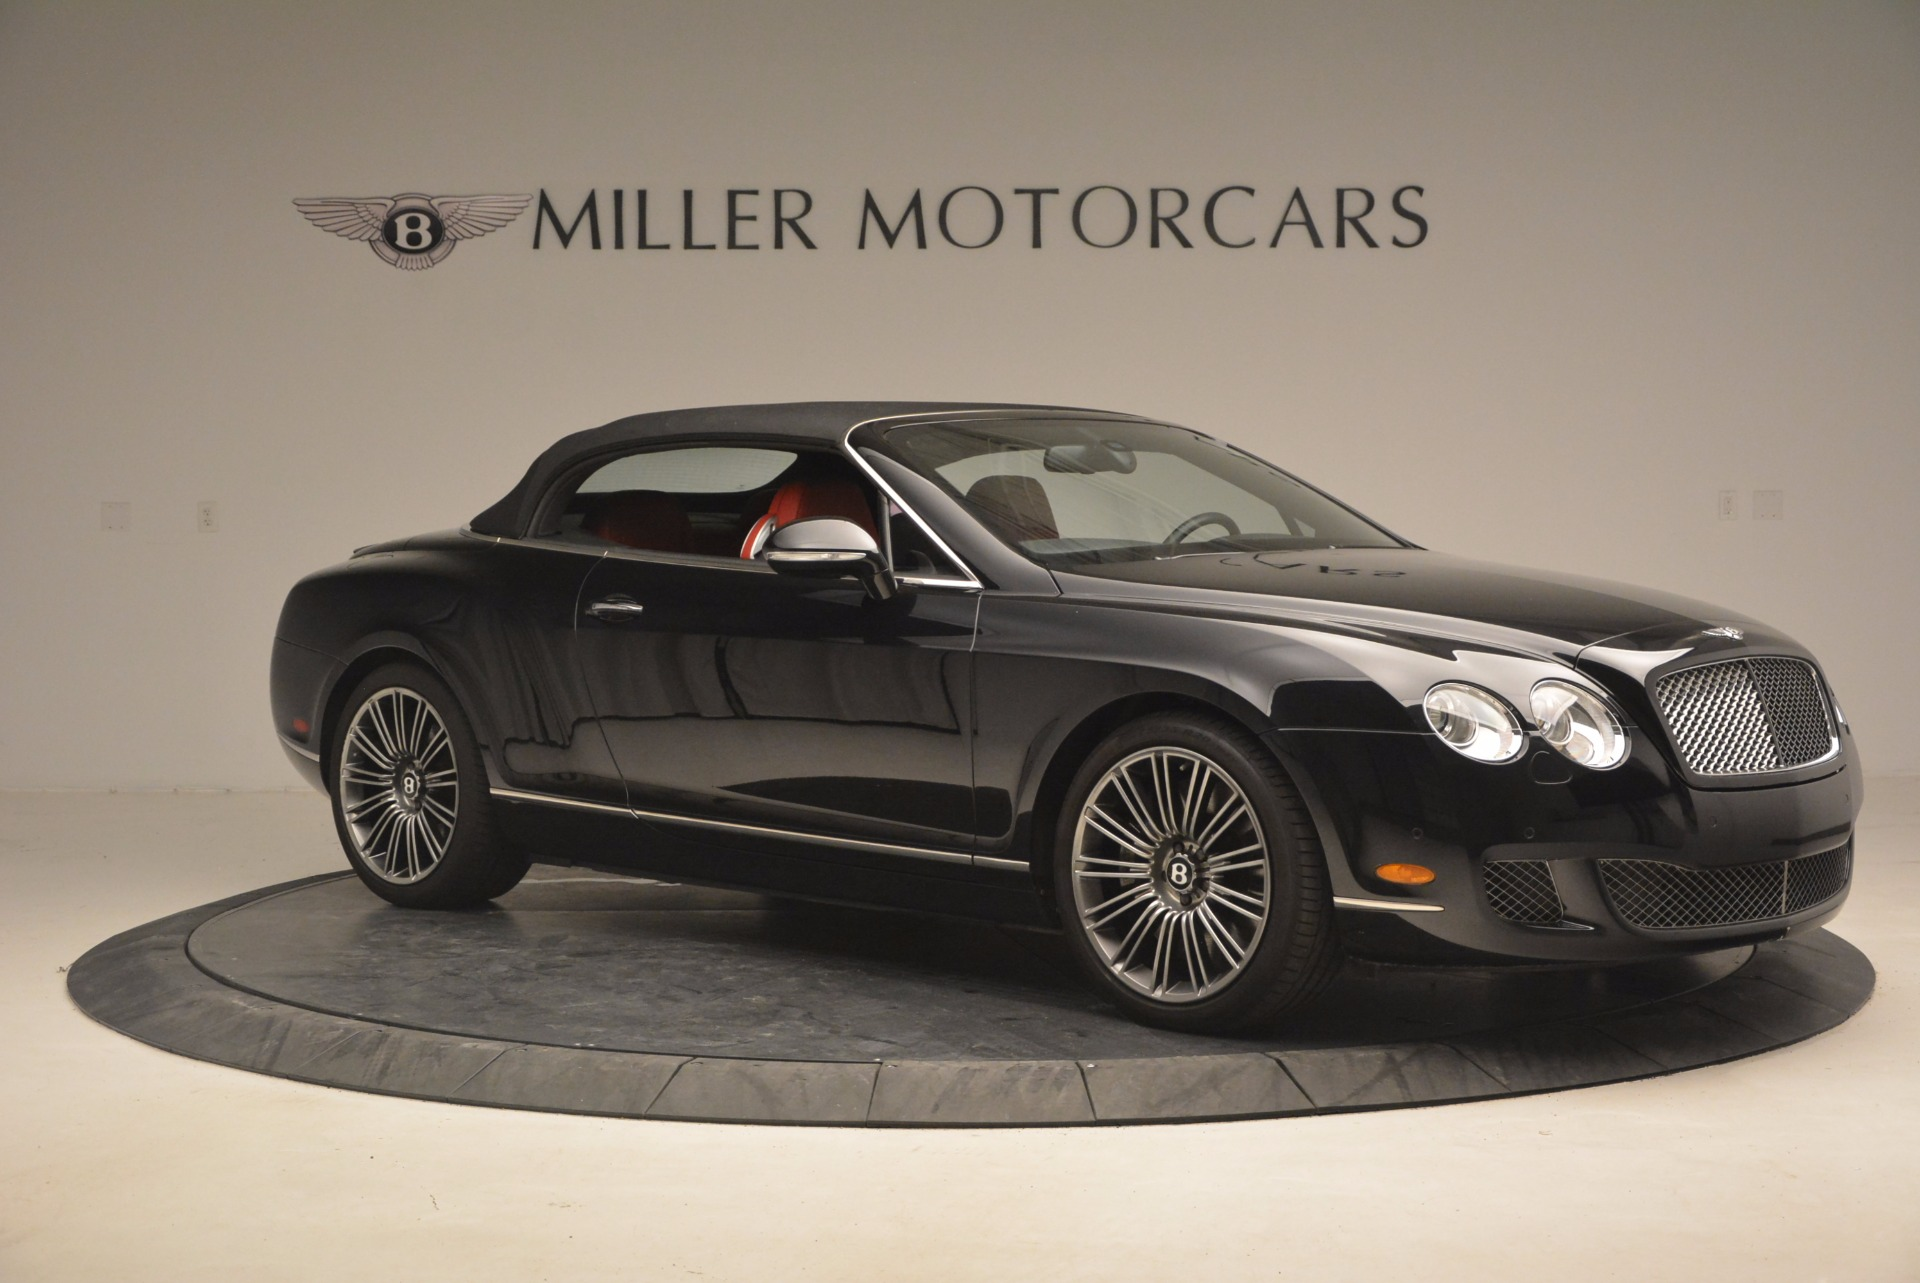 Used 2010 Bentley Continental GT Speed For Sale In Westport, CT 1298_p23